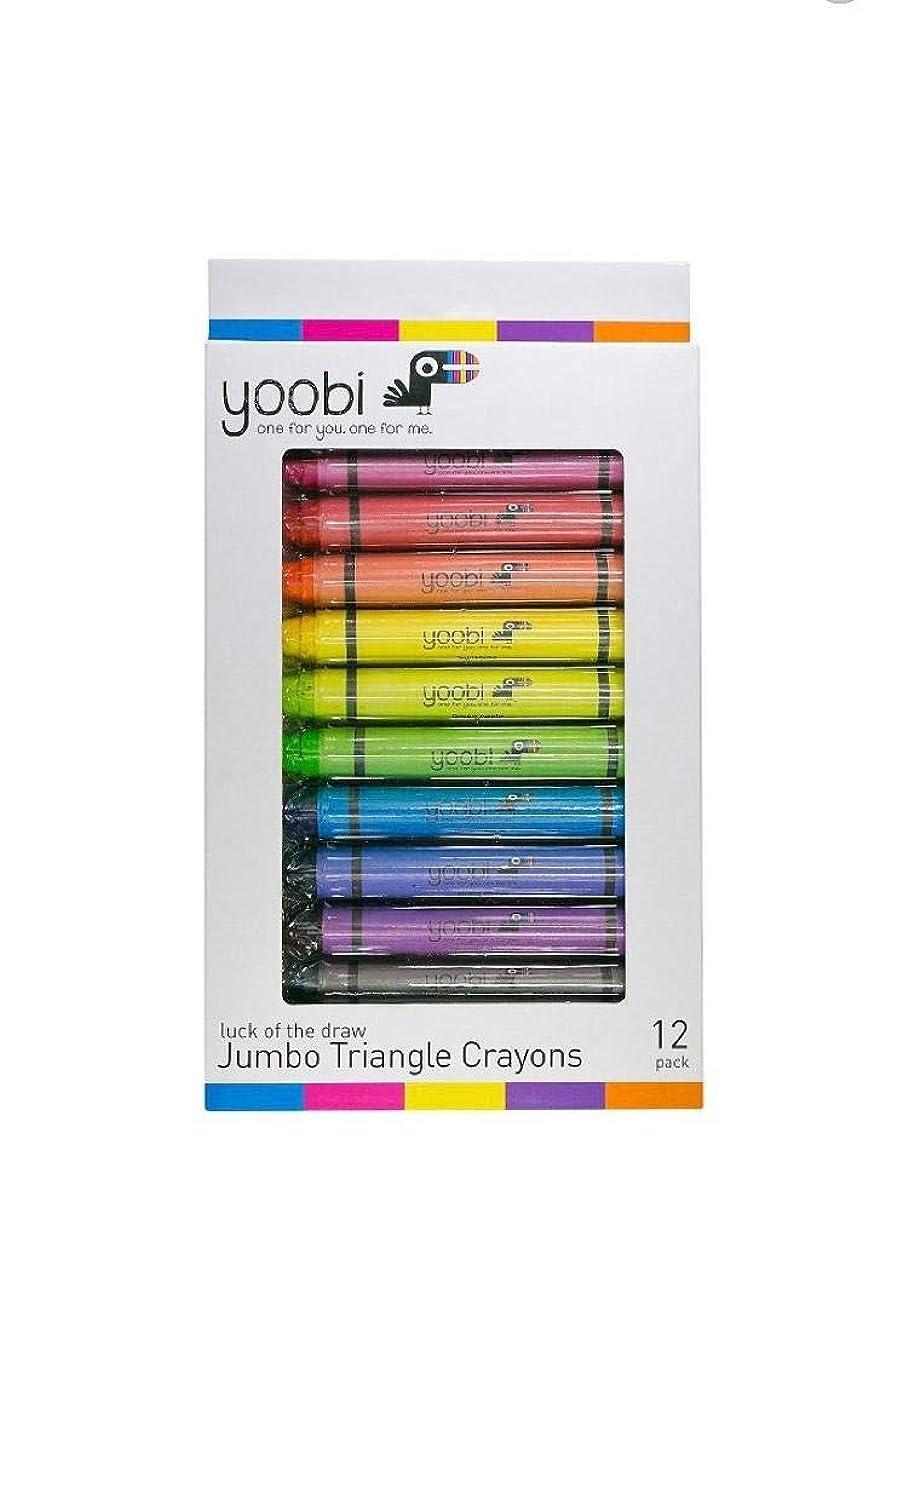 Yoobi Jumbo Triangle Crayons - Multicolor, 12 Pack